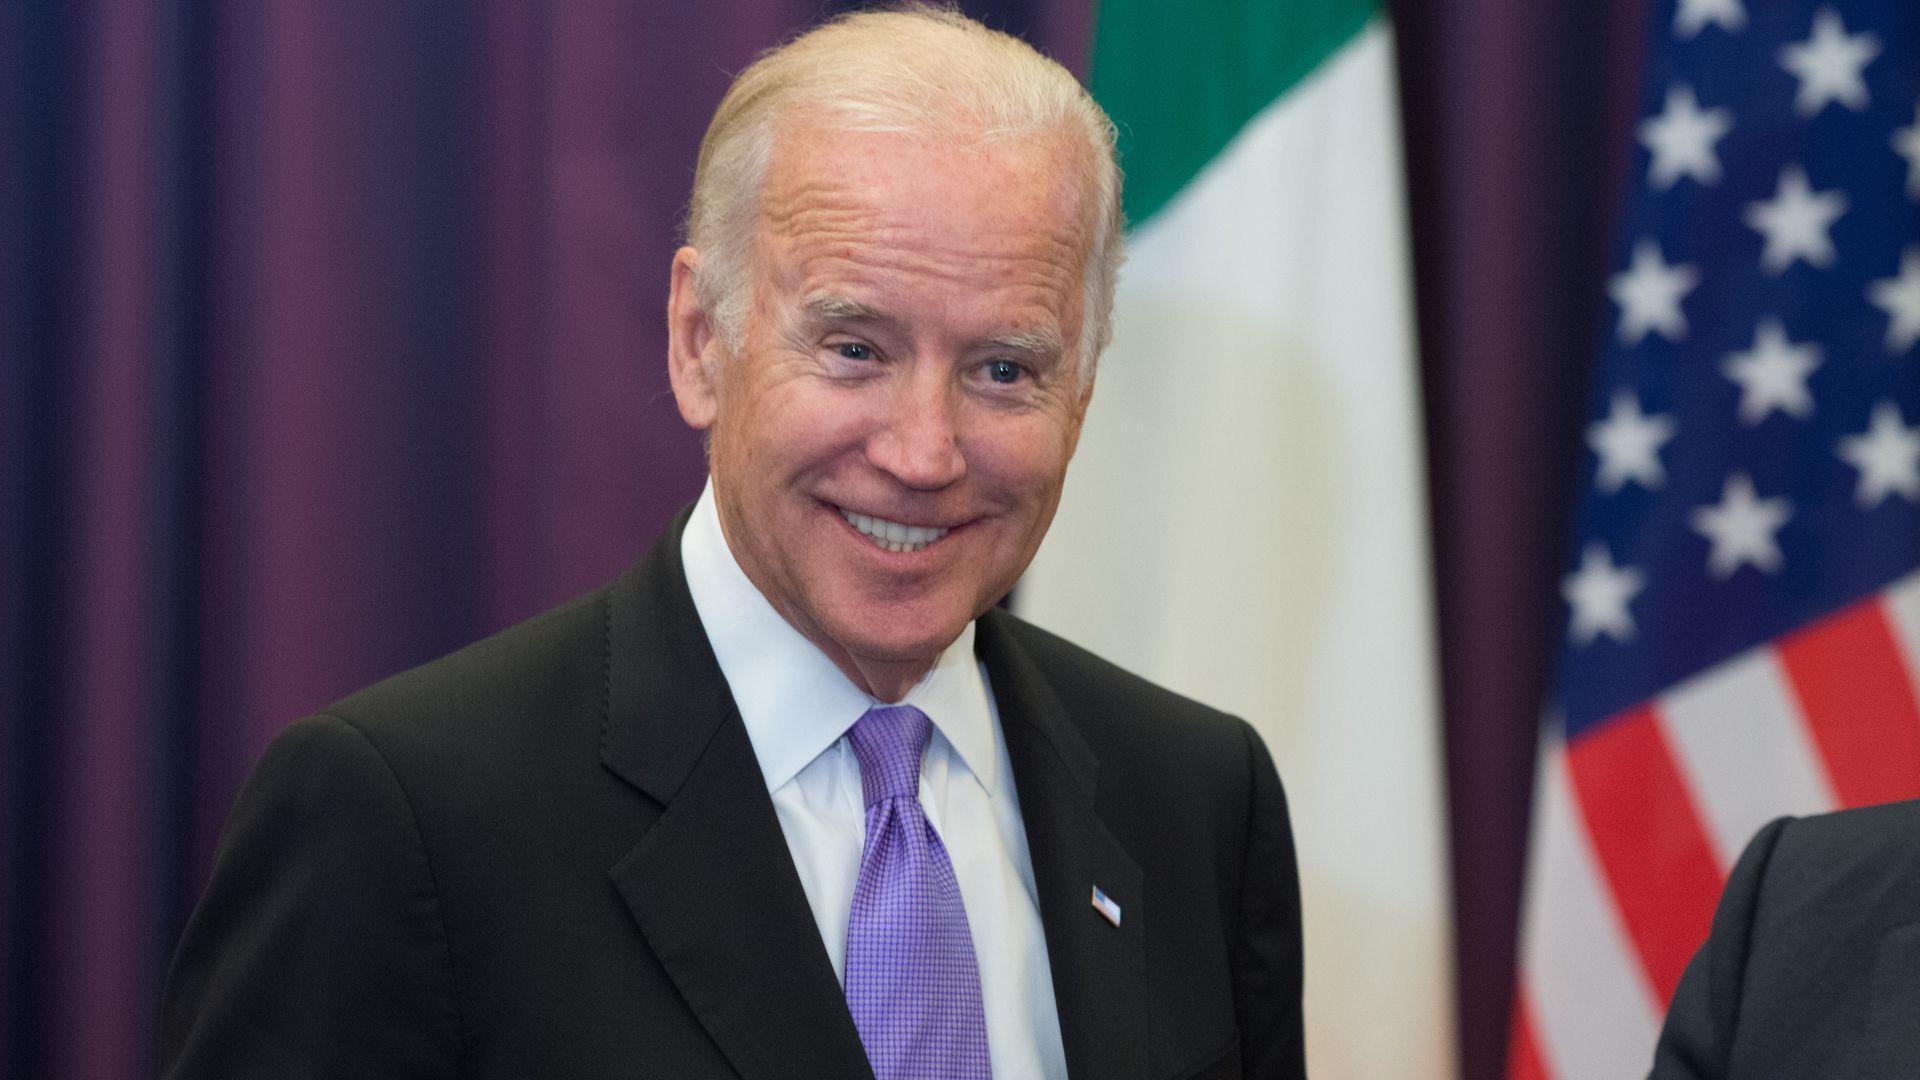 Joe Biden at the government Buildings, Dublin, Ireland during a 2015 tour - Credit: PA